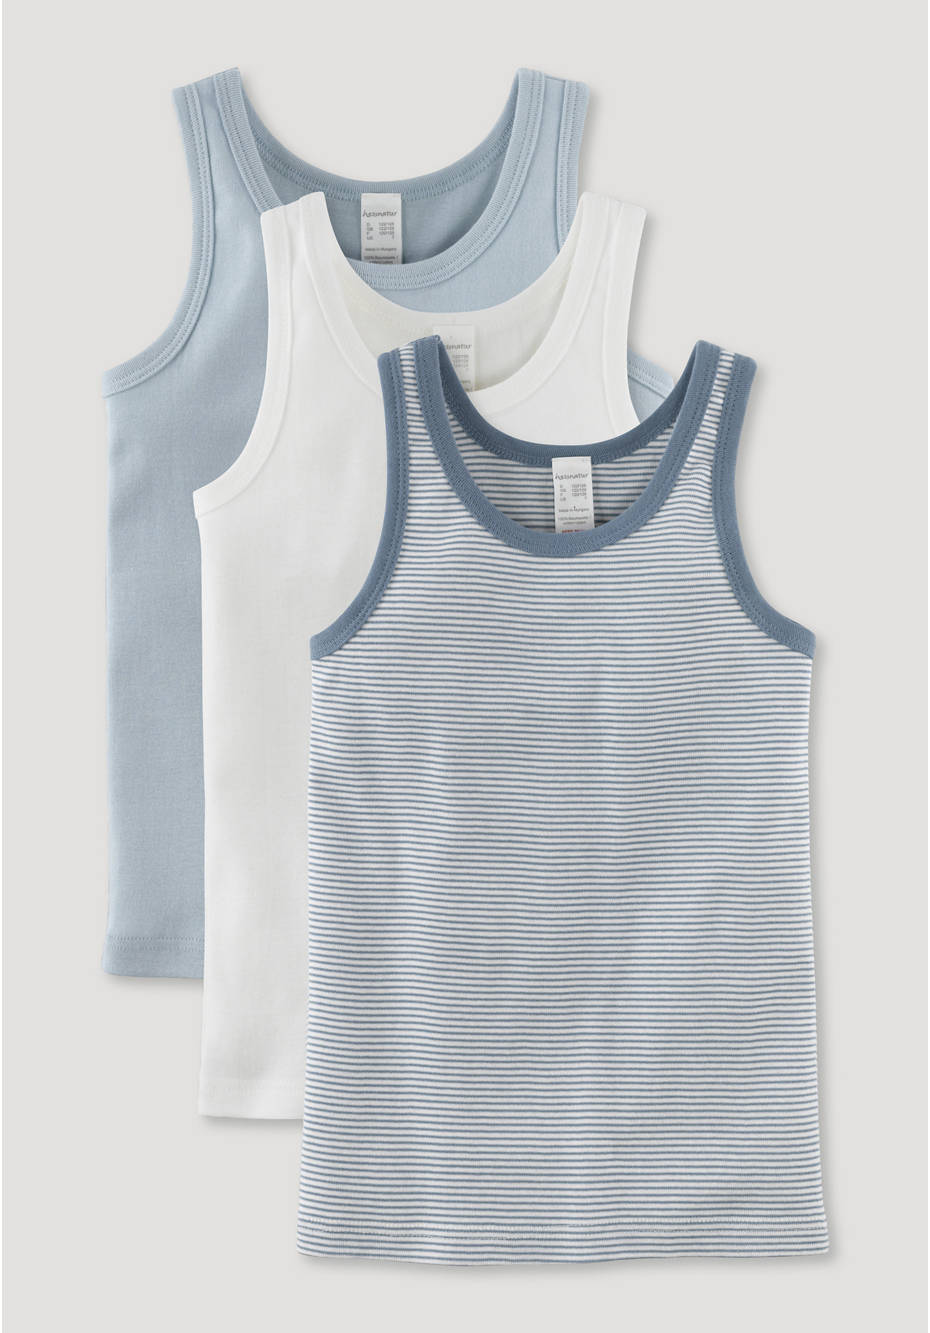 Boys undershirt, set of 3 made of pure organic cotton